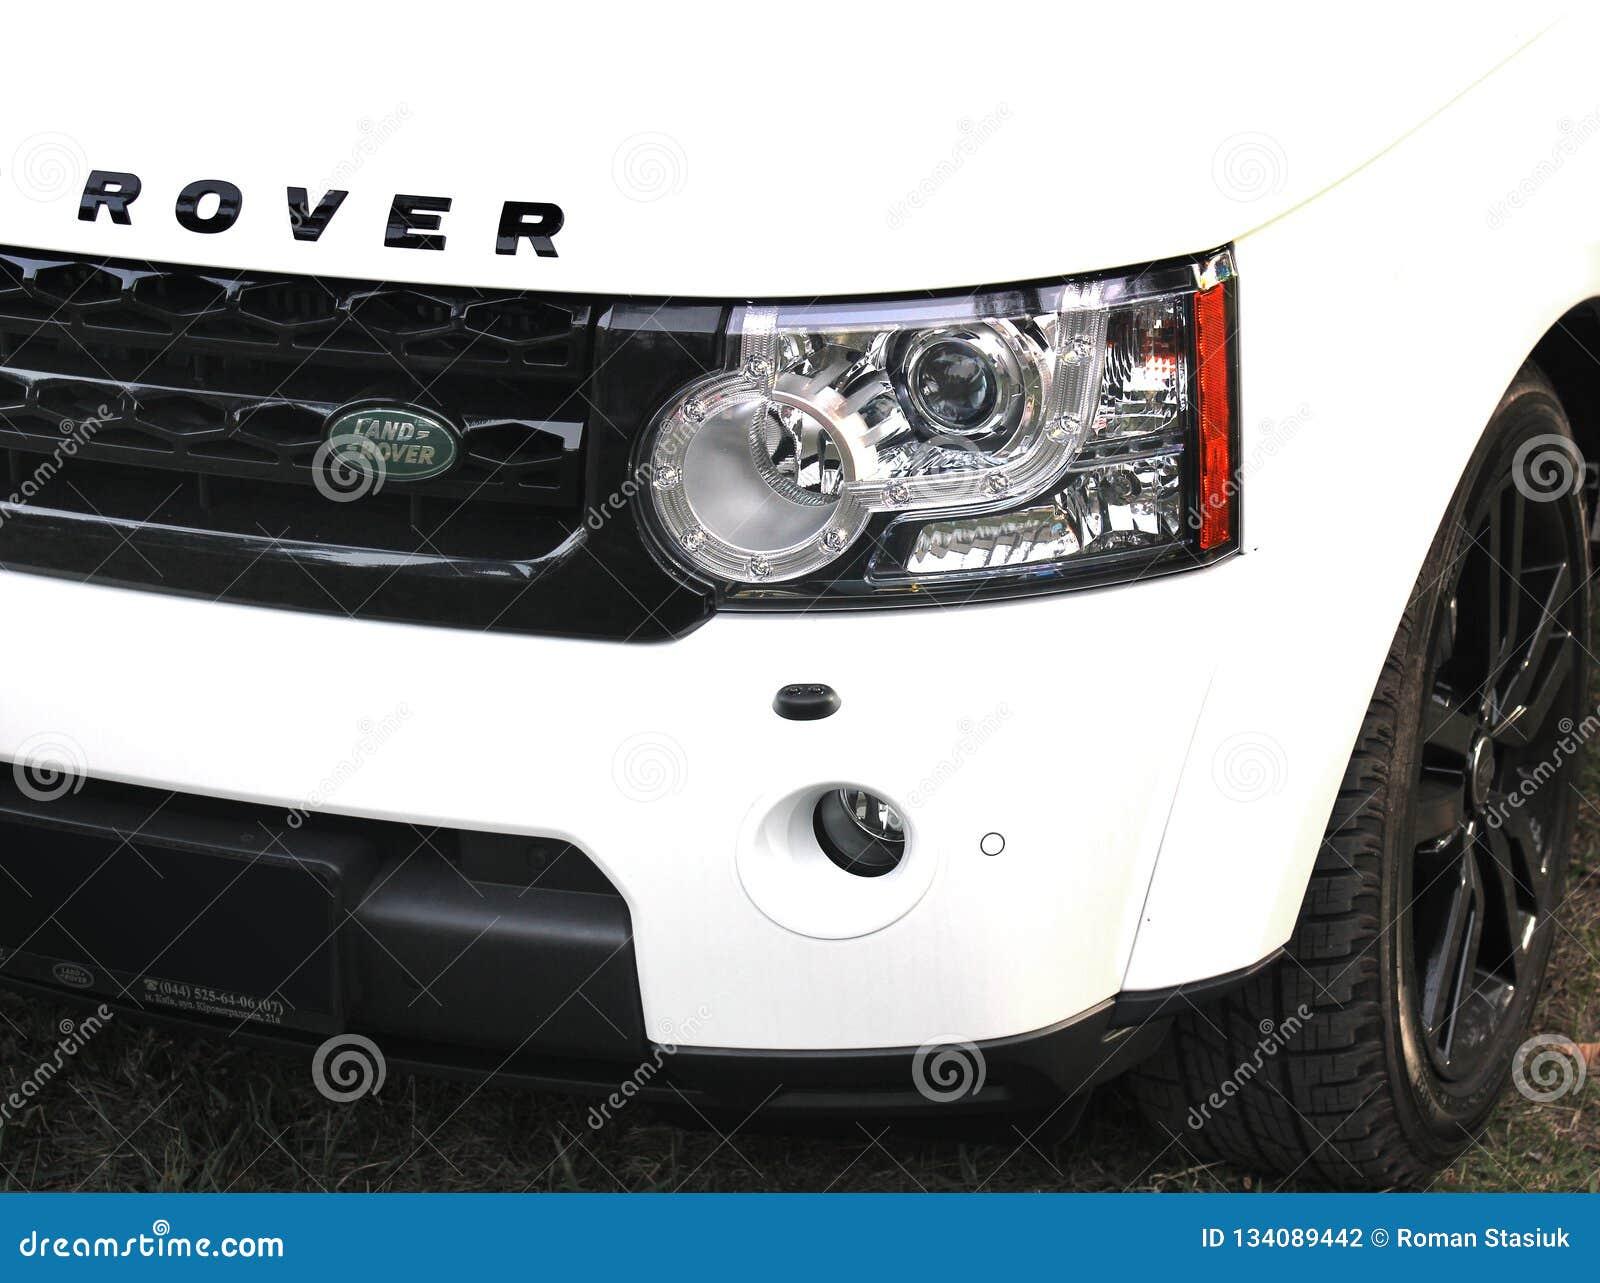 25 april, 2015 Kiev, de Oekraïne; Landwaaier Rover Discovery 4